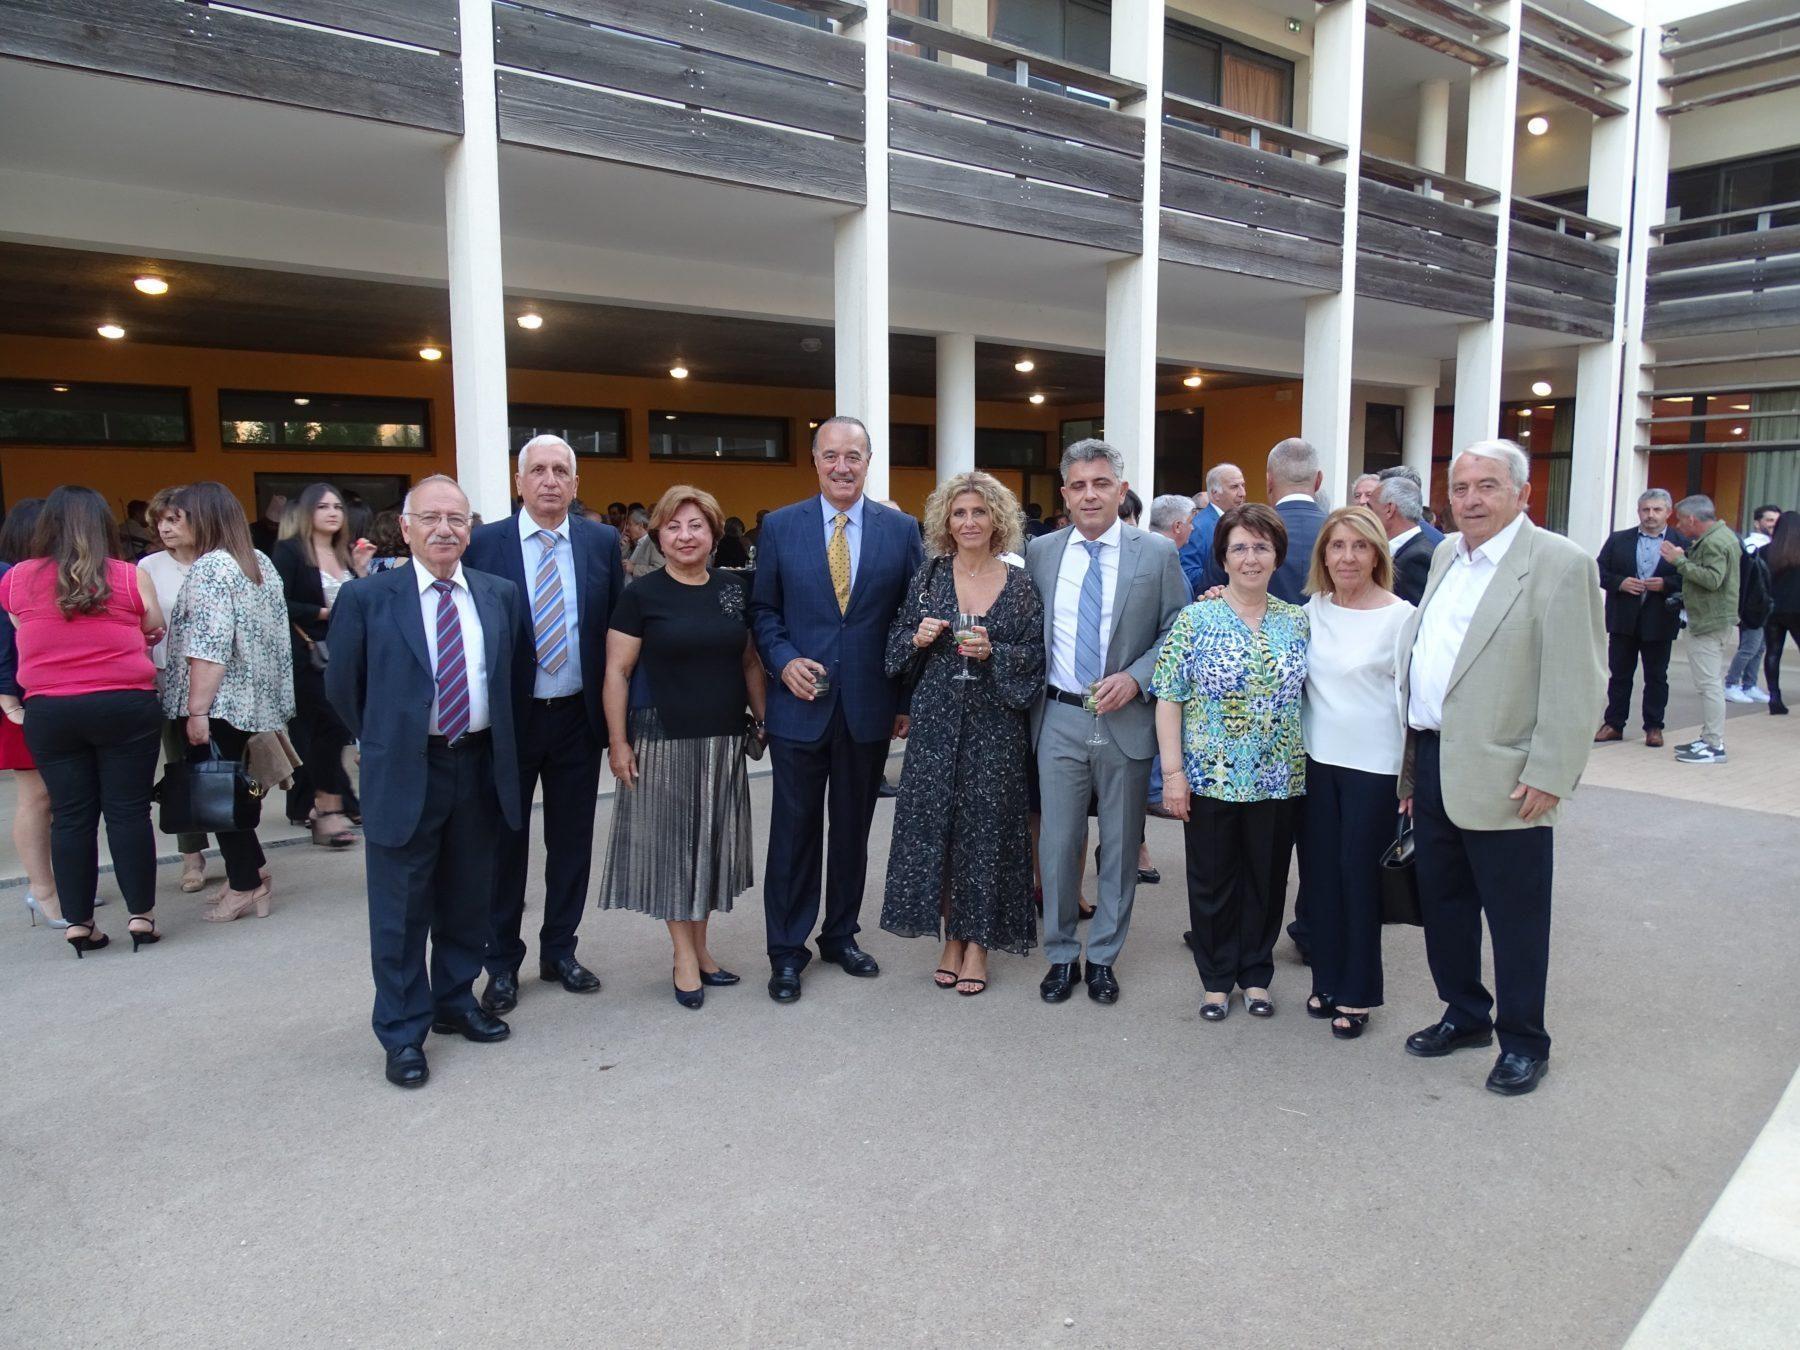 Hamazkayin Djemaran in Marseille Holds Annual Dinner